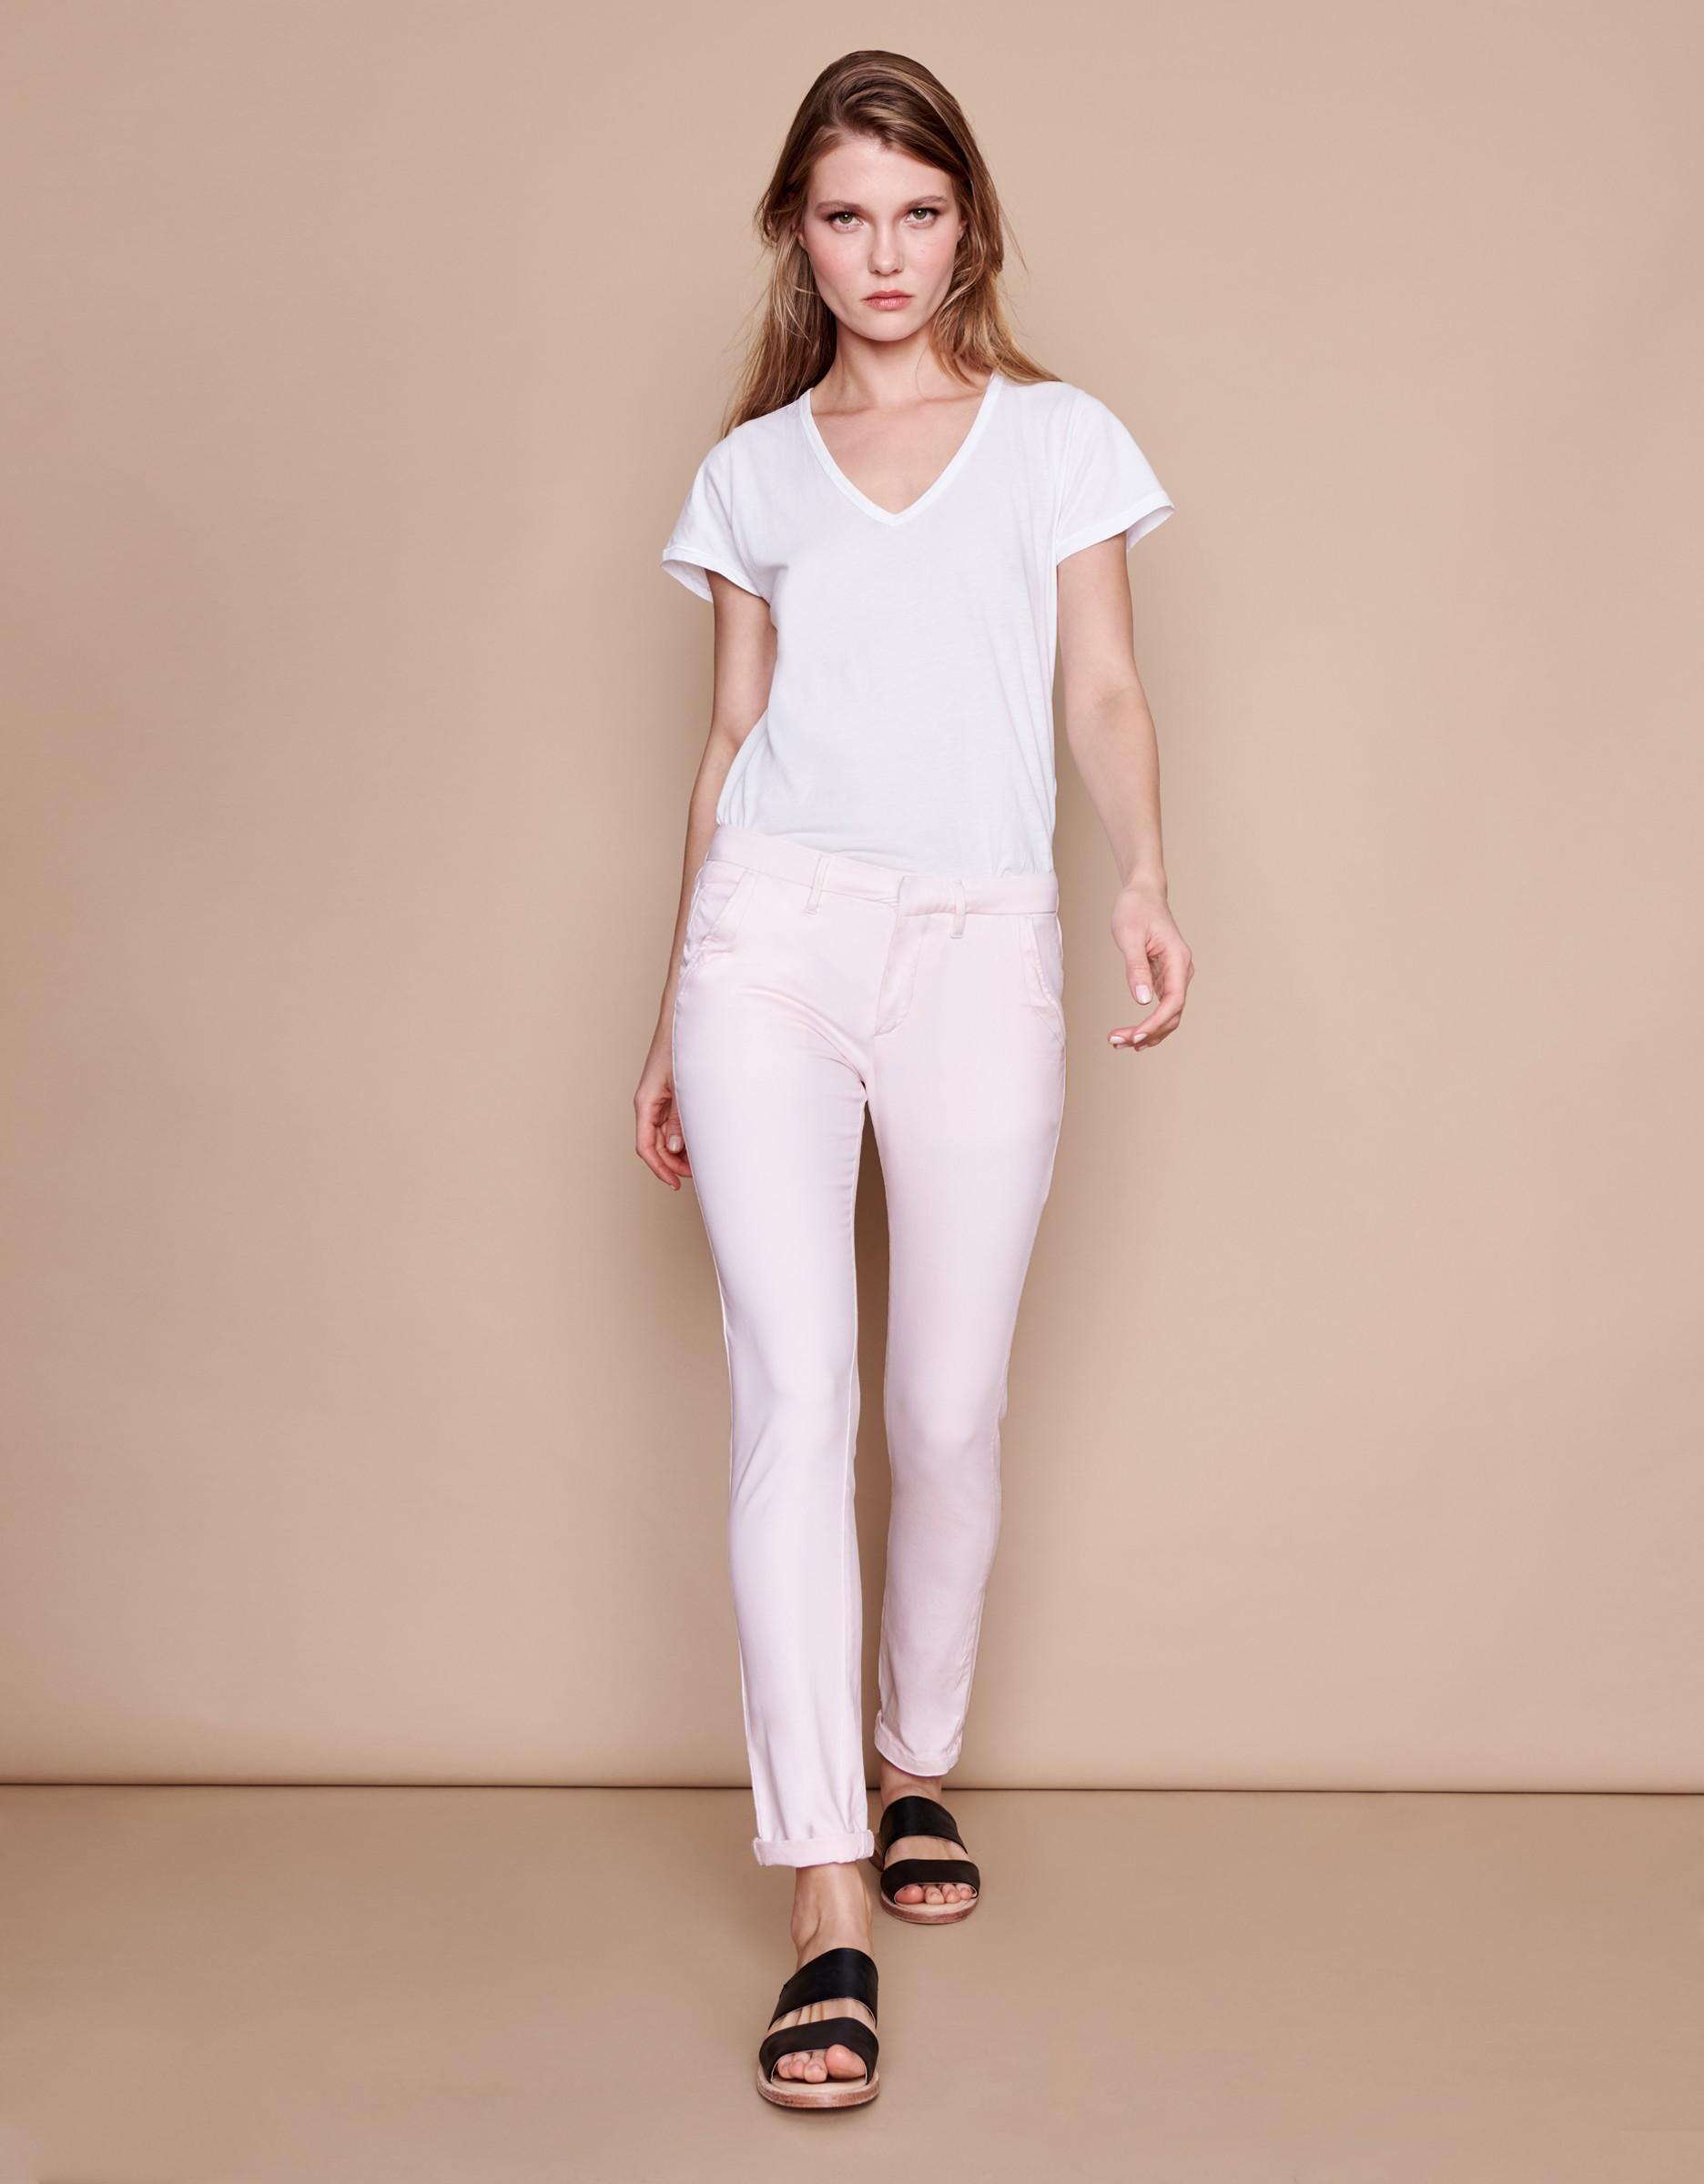 pantalon chino sandy basic 2 rose pale. Black Bedroom Furniture Sets. Home Design Ideas